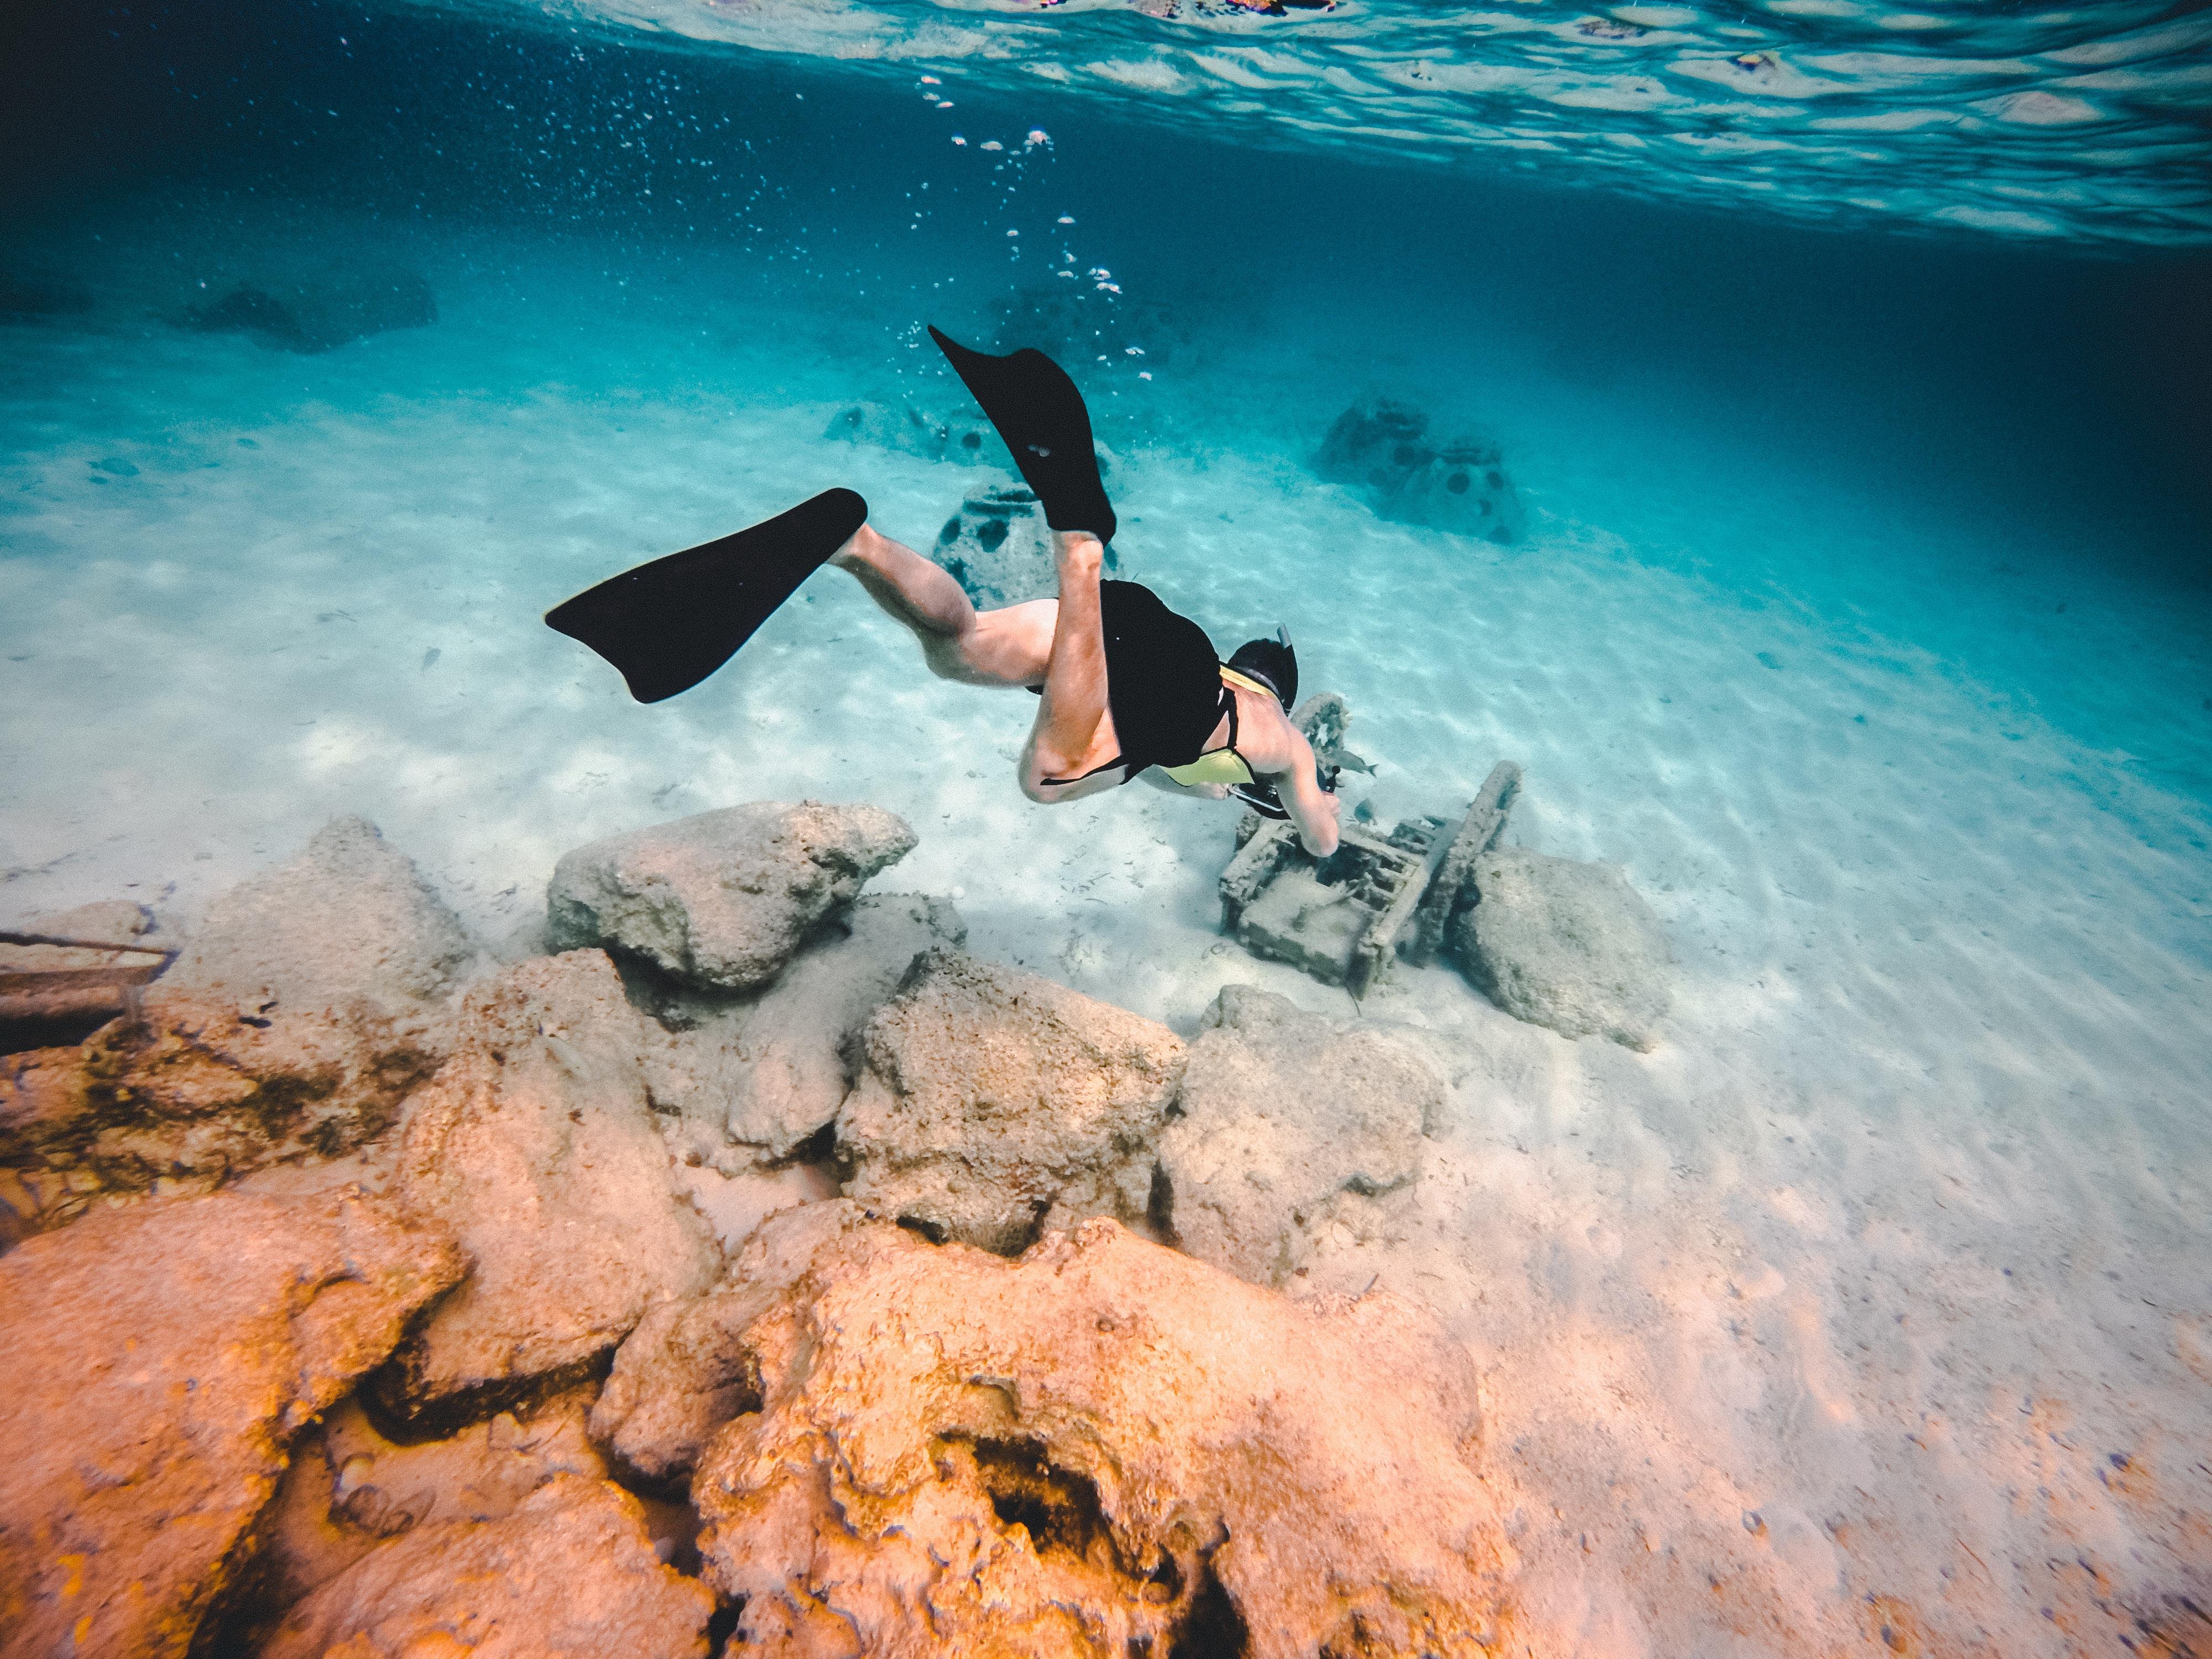 bahamas, sea, travel, boat, blue, snorkelling